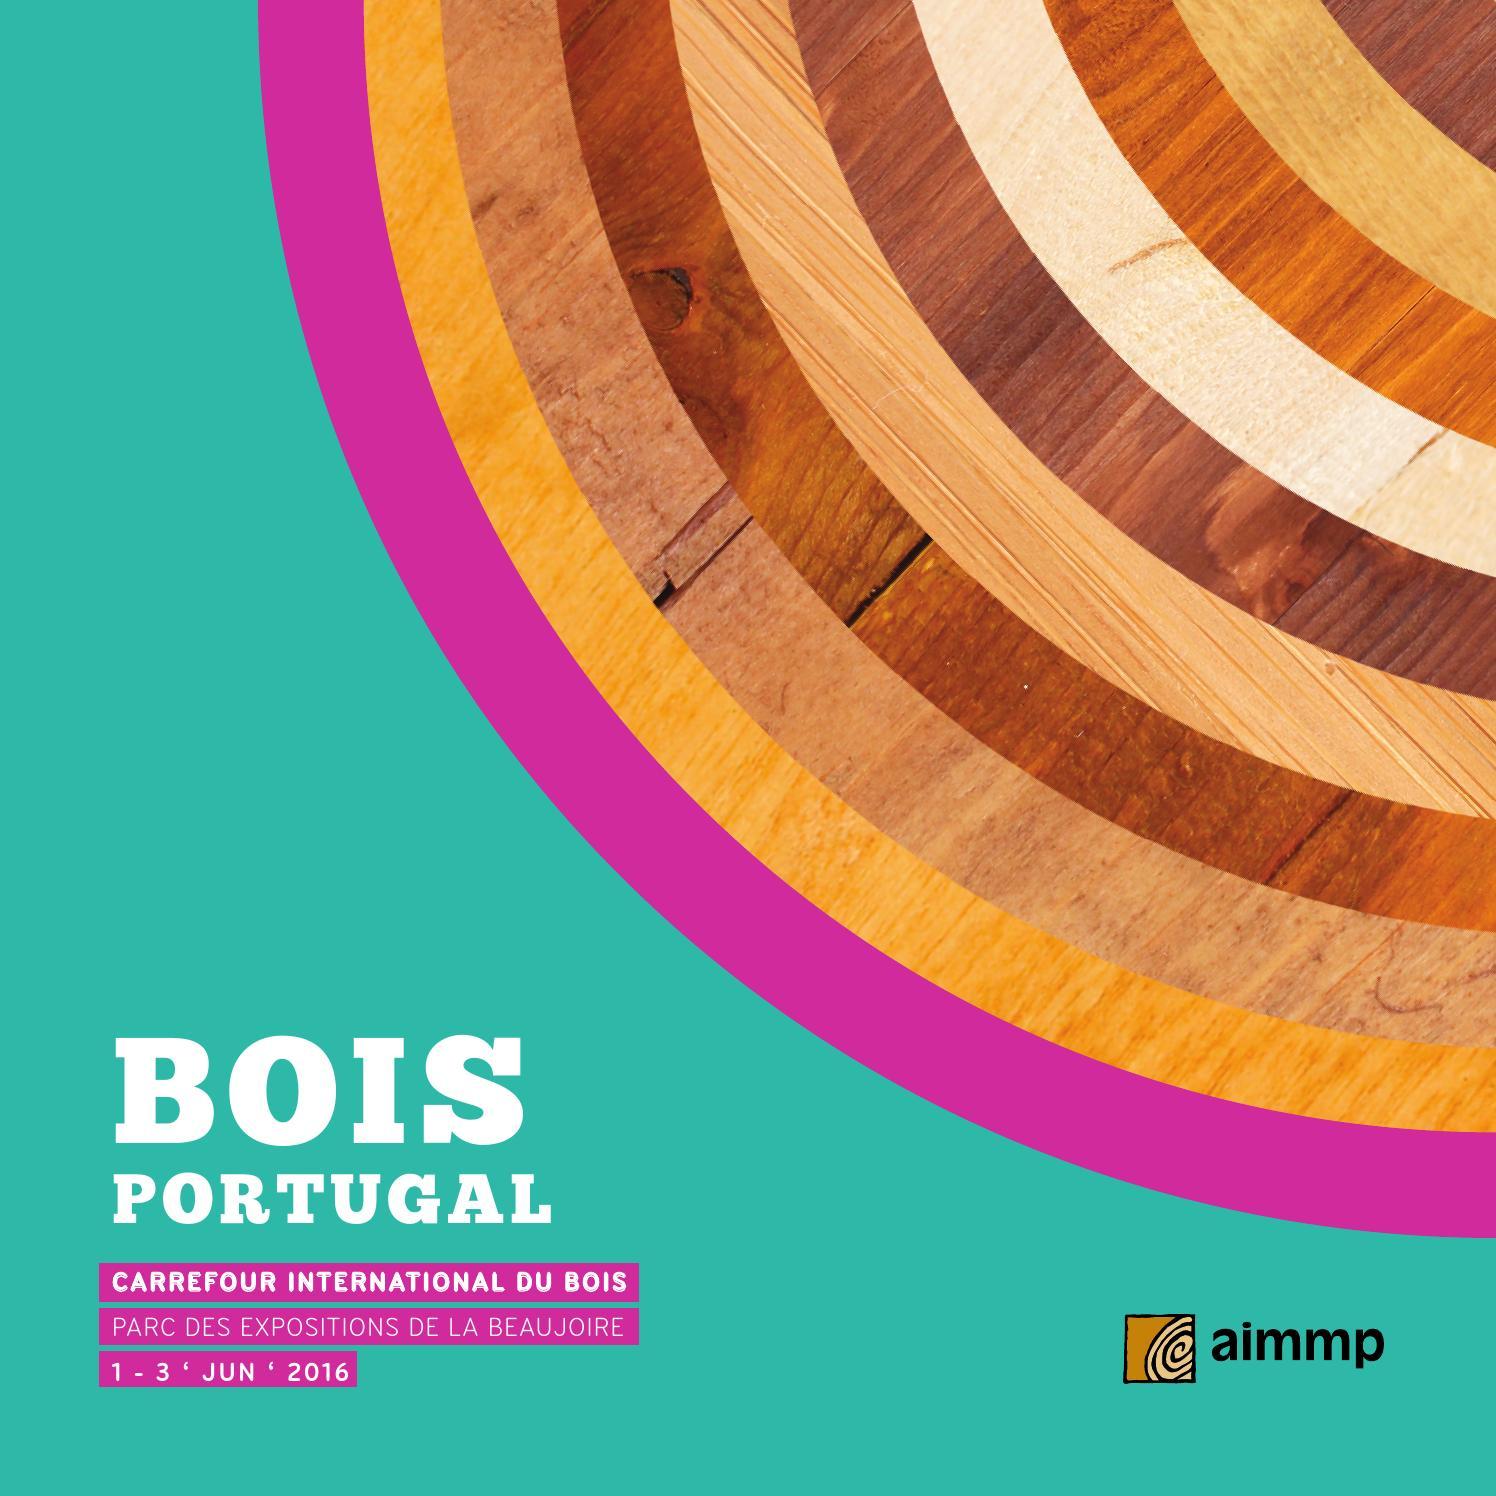 aimmp portugal carrefour